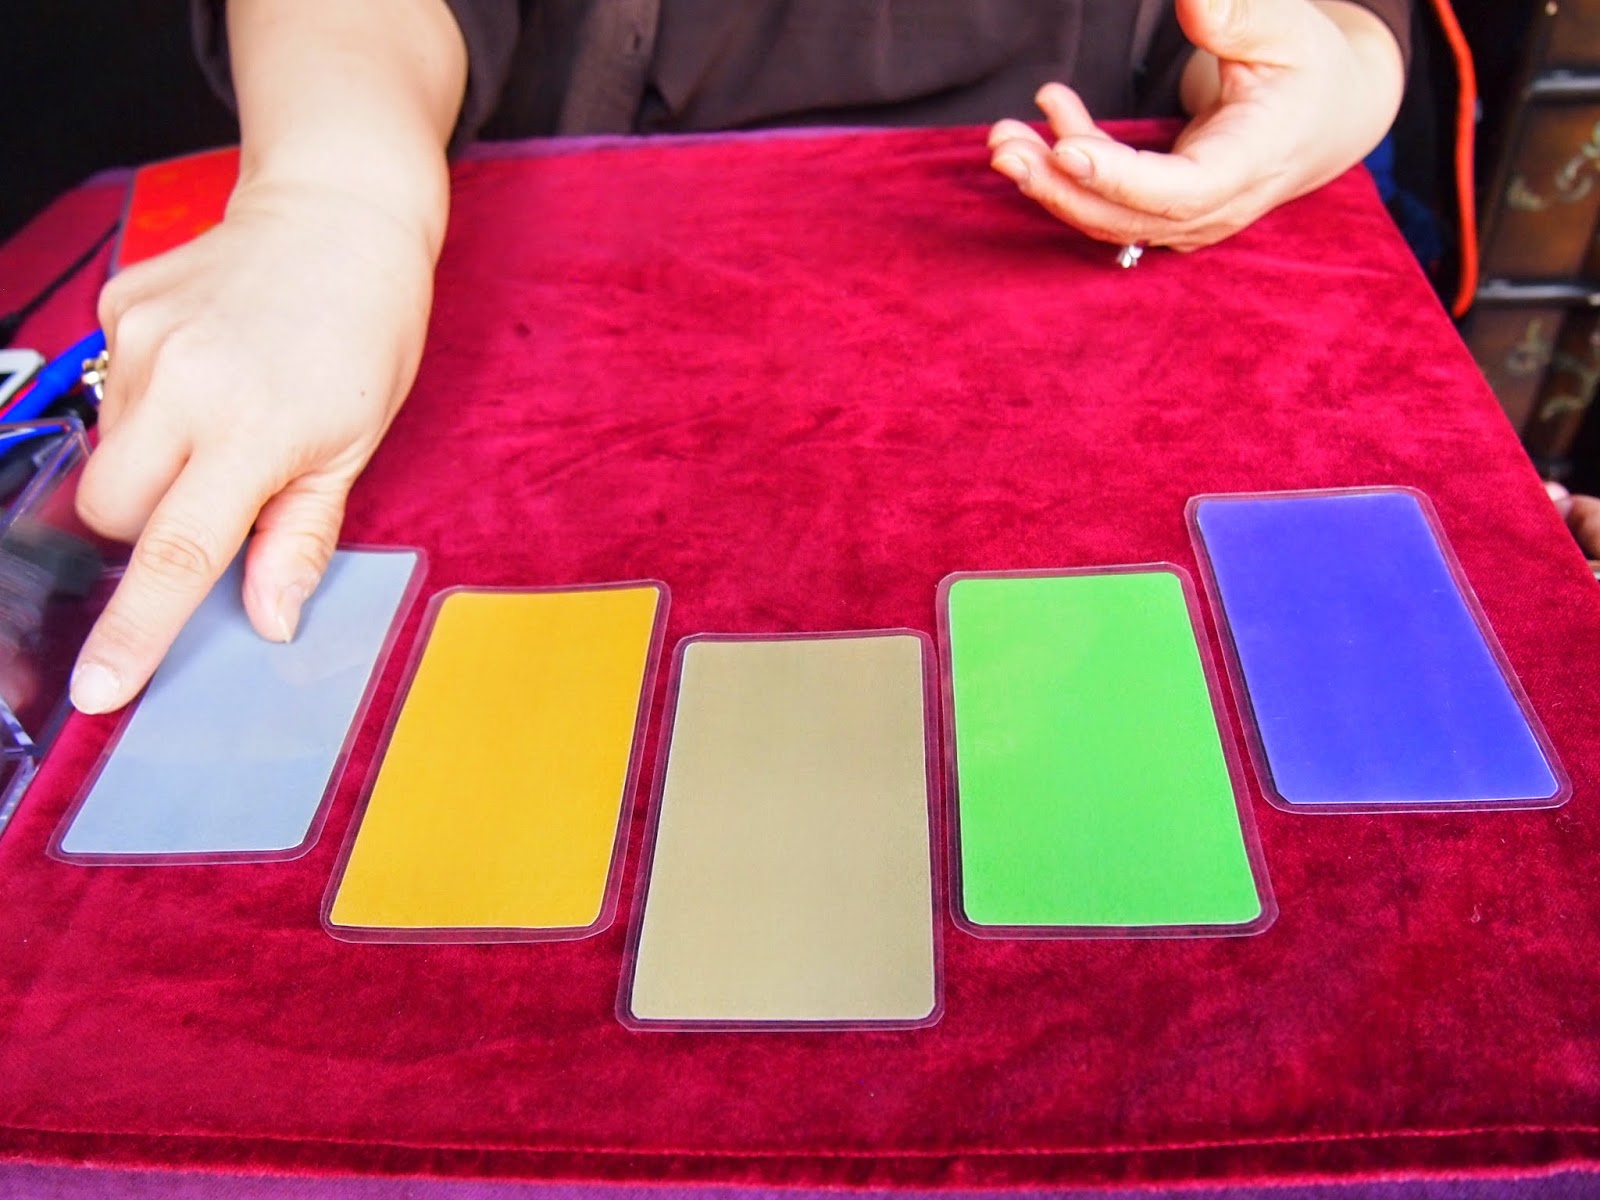 My First Korean Tarot Card Reading |Seoul Searching